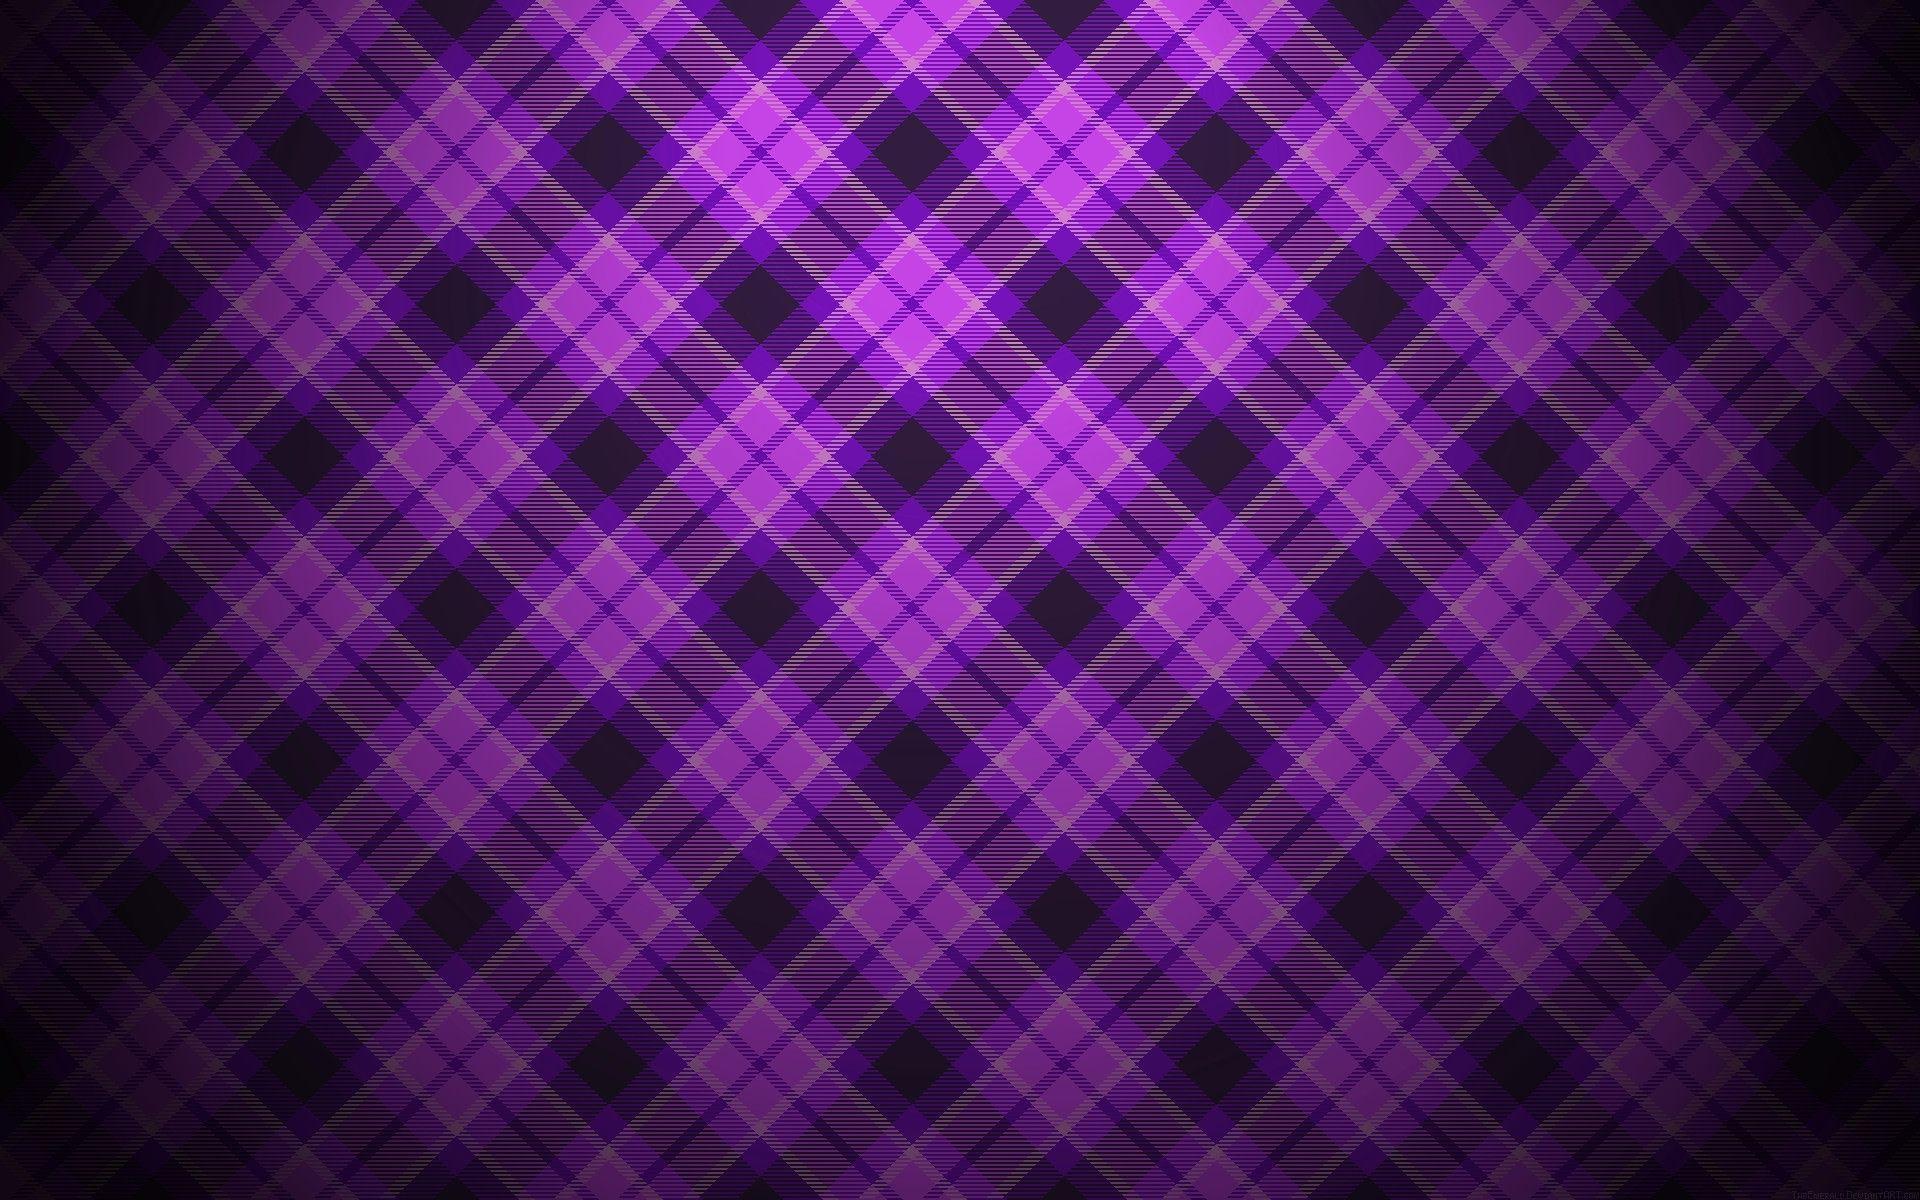 Purple Pattern Wallpapers Top Free Purple Pattern Backgrounds Wallpaperaccess